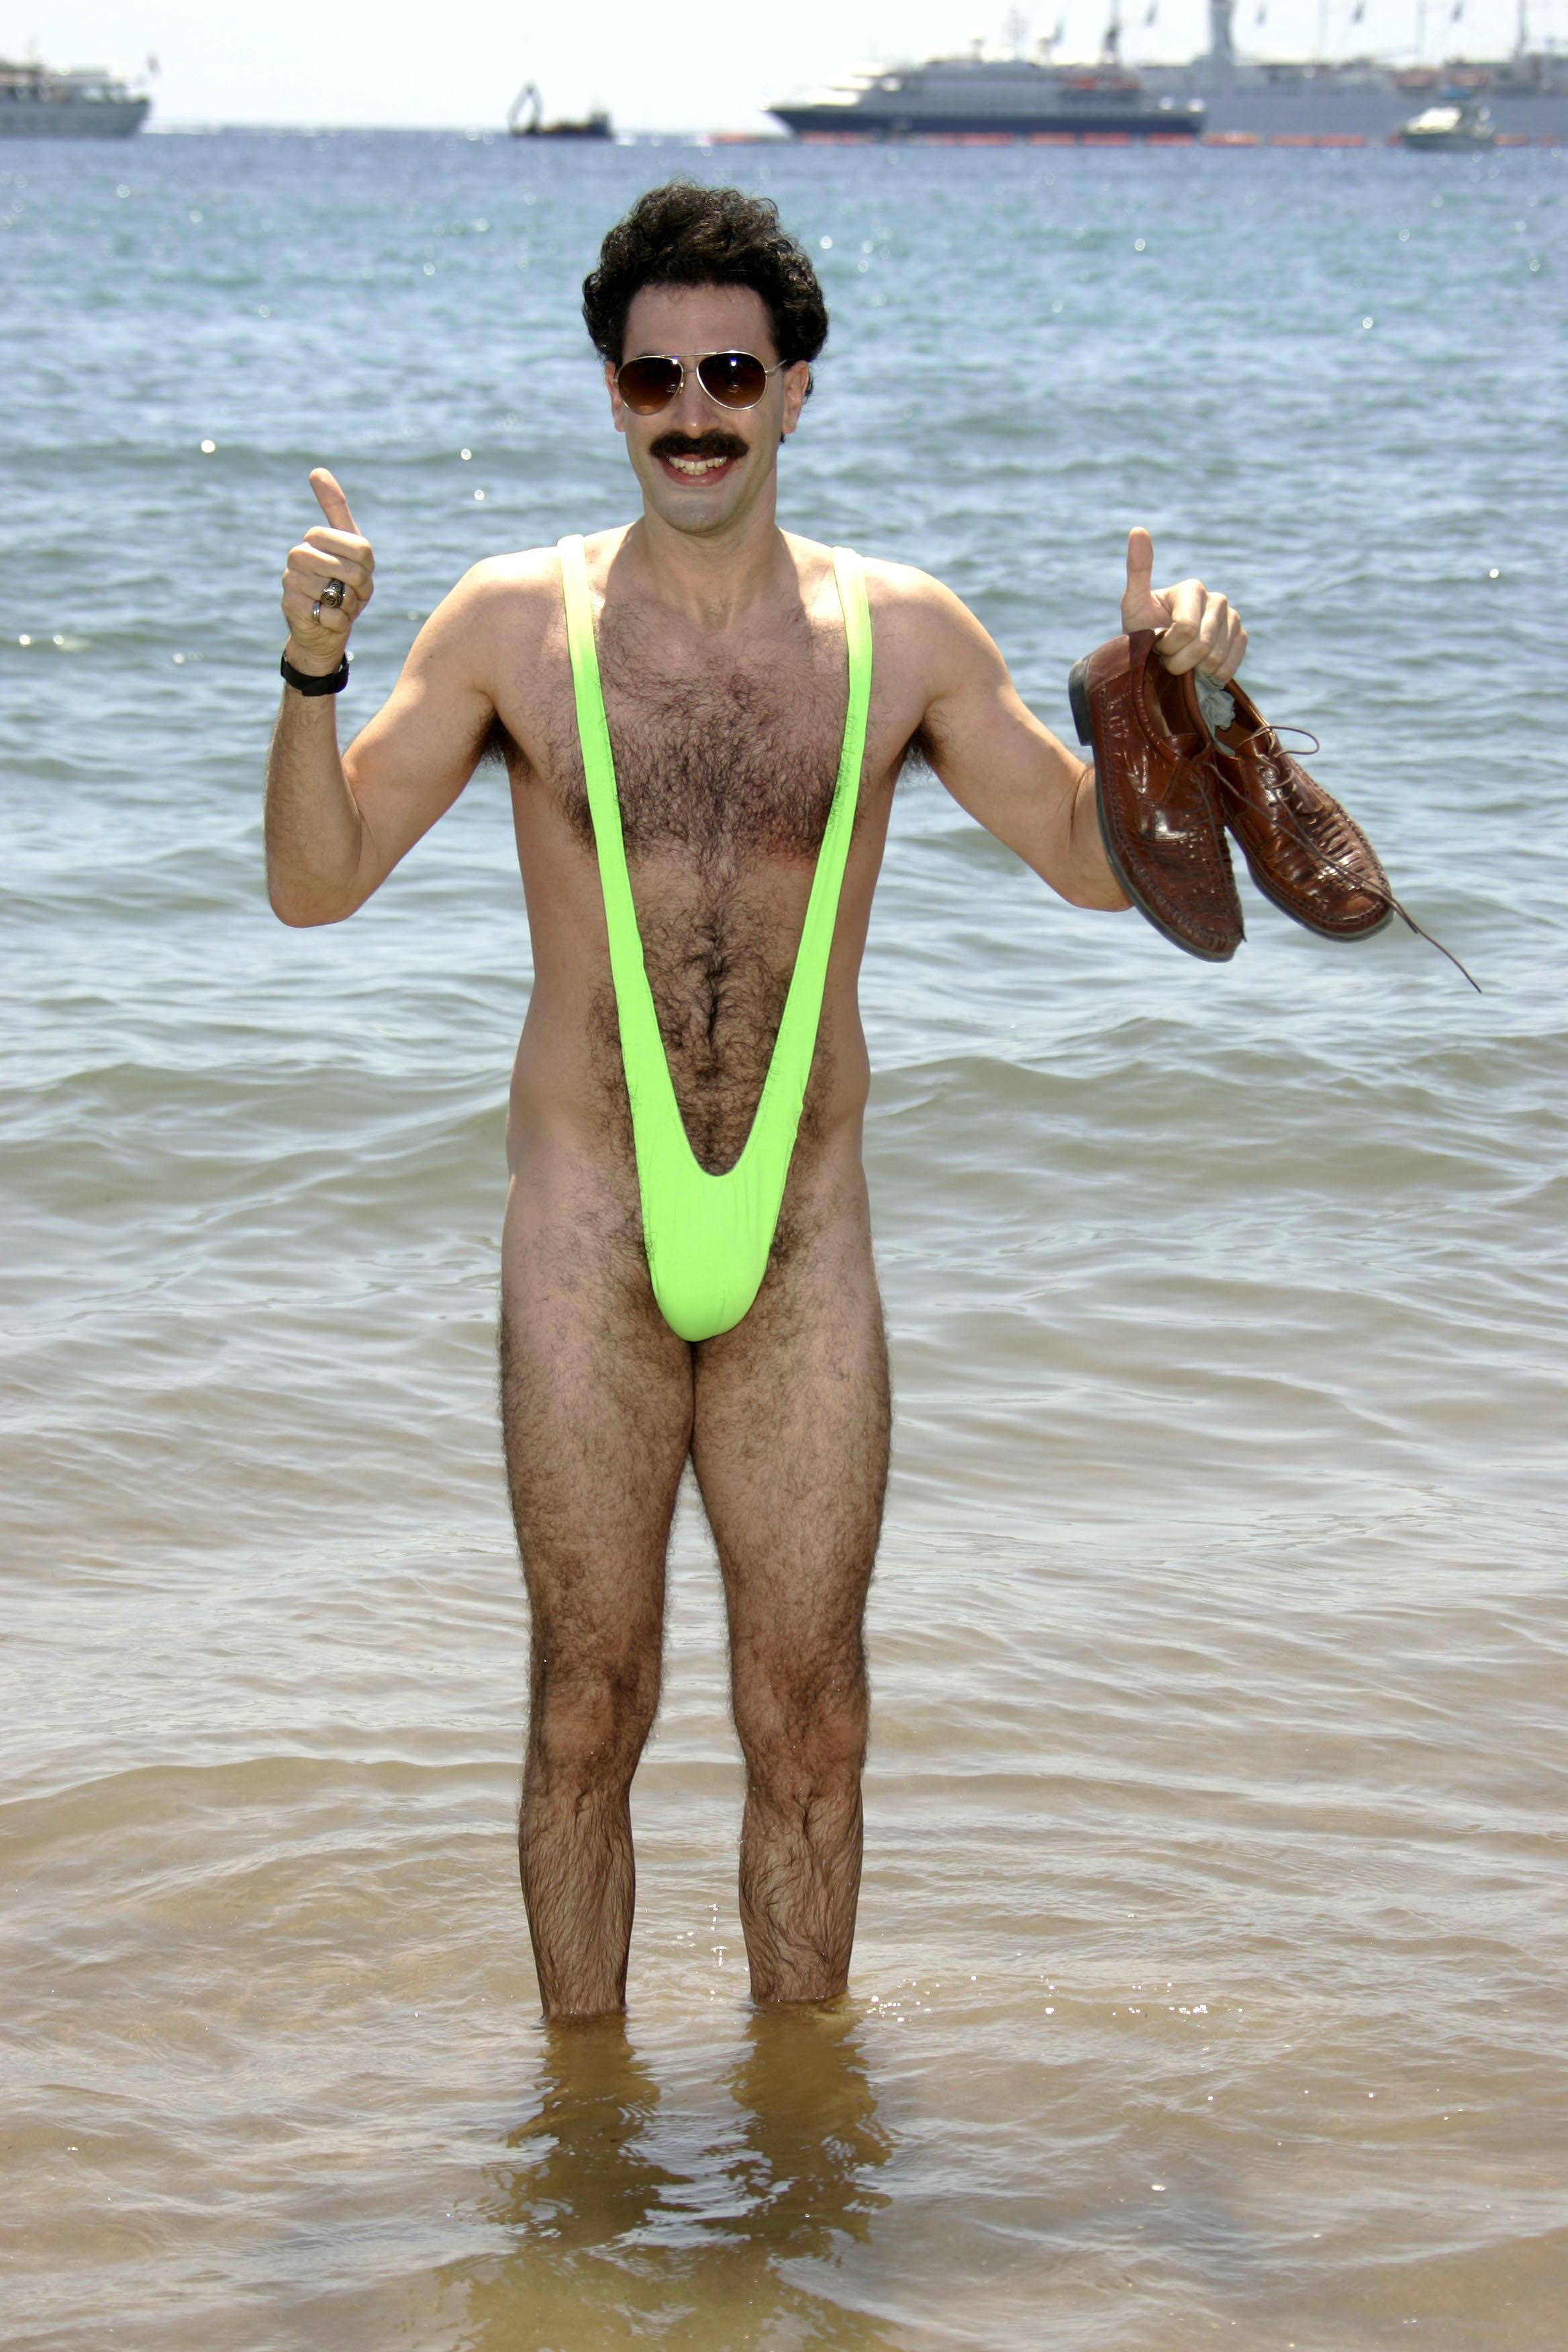 Tourists Sacha Arrested Wearing Helps 'borat' For Bikini Cohen Baron 5L3jq4RA